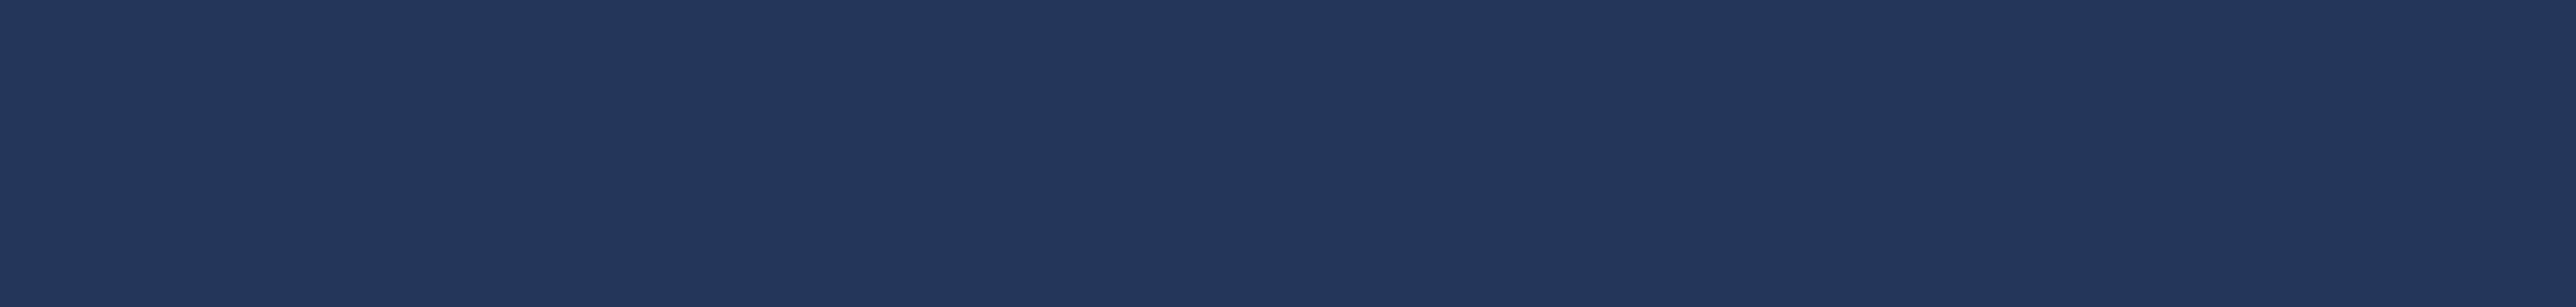 Logo di Appdynamics